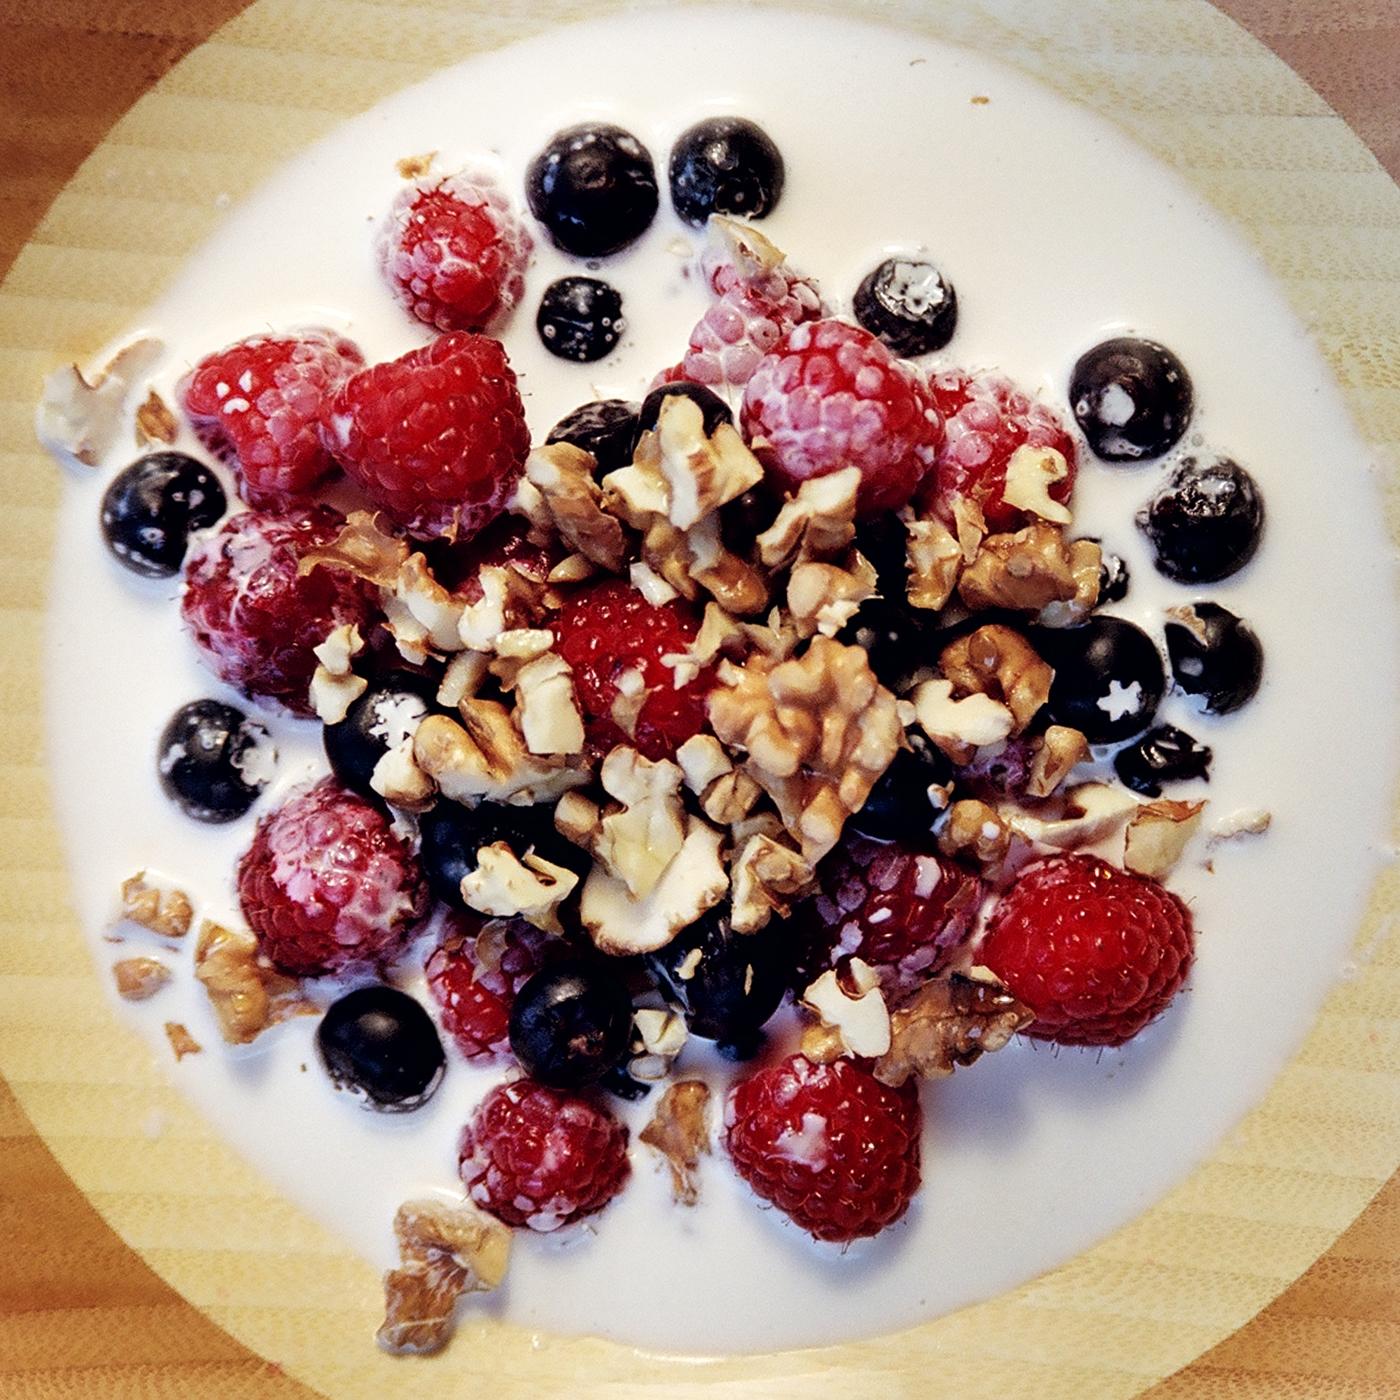 berries_cream.jpg